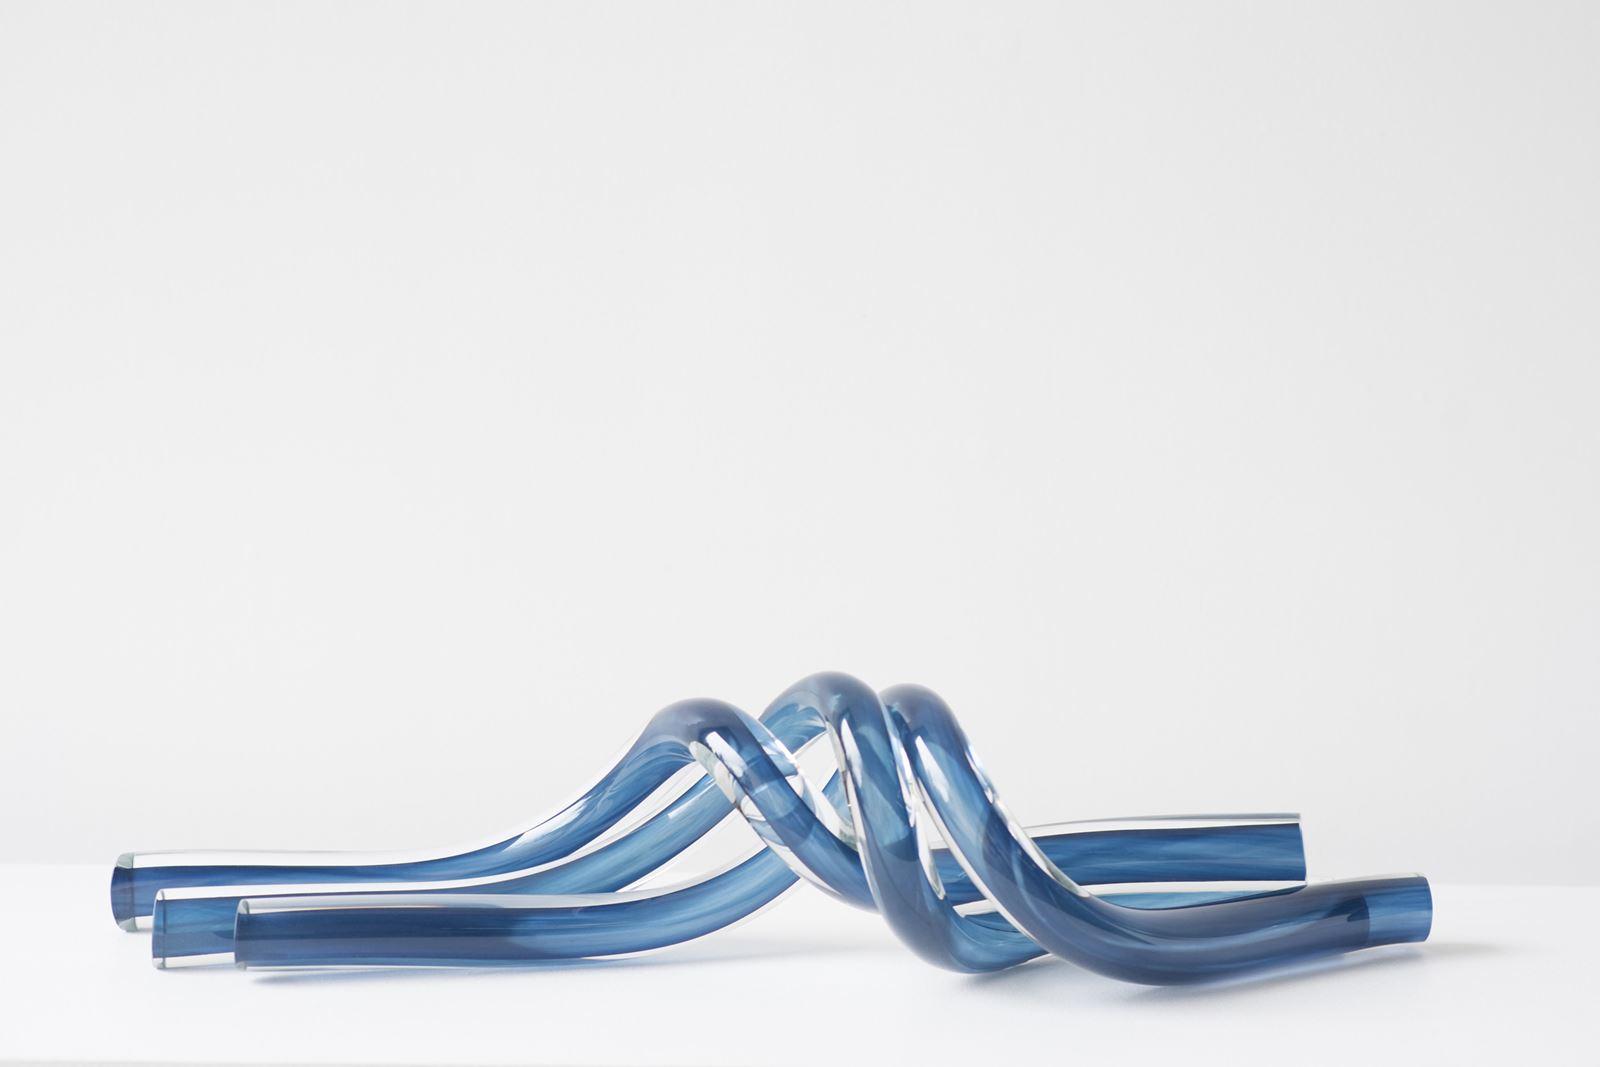 steel blue 24″L (60cm)